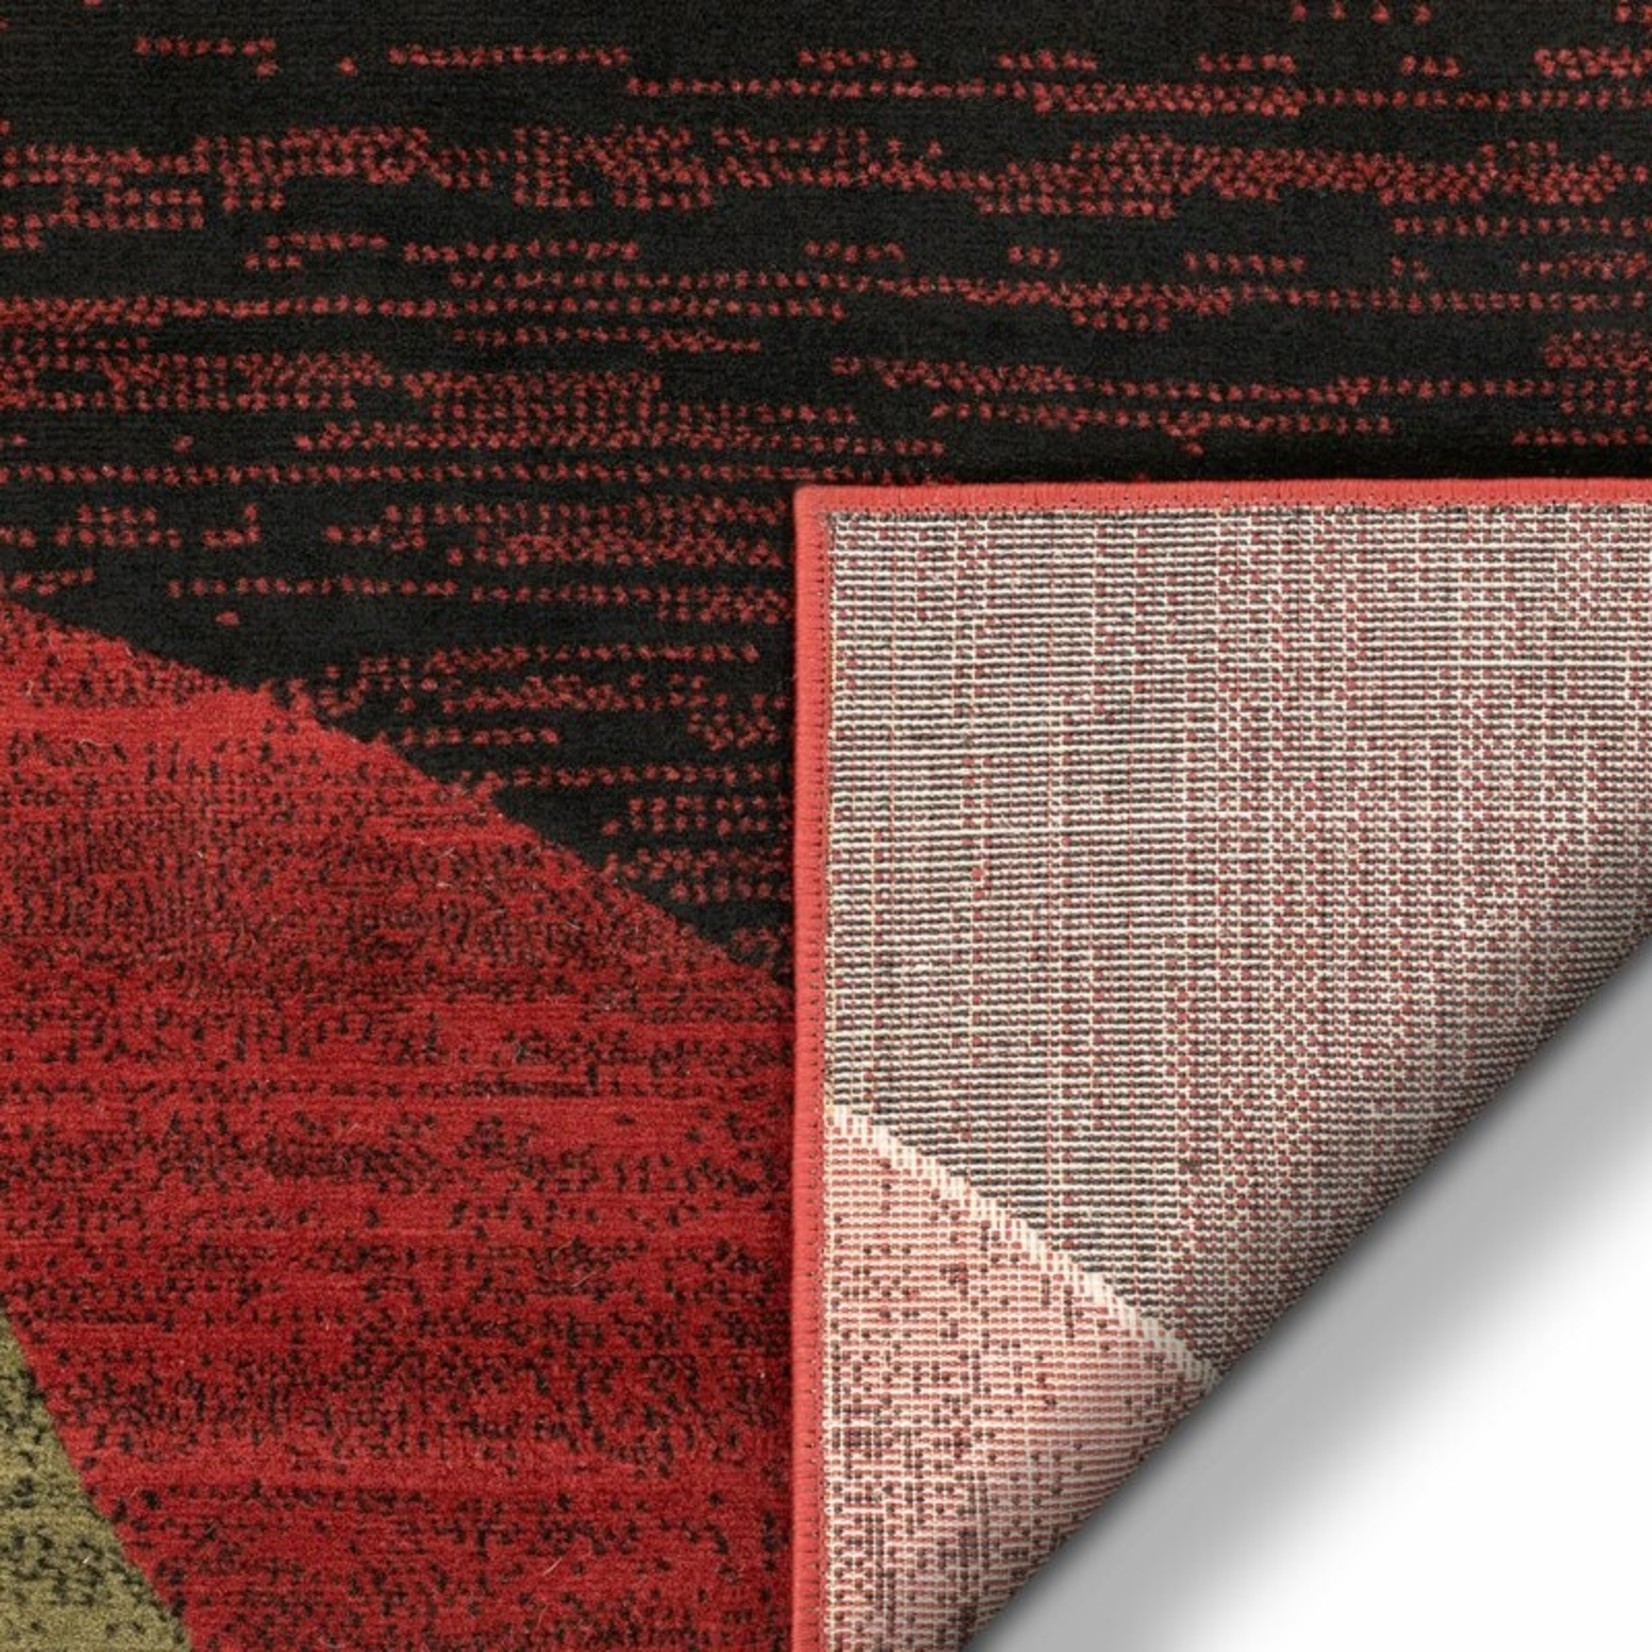 *2'7 x 3'11 -  Chelsi Power Loom Red/Beige Rug